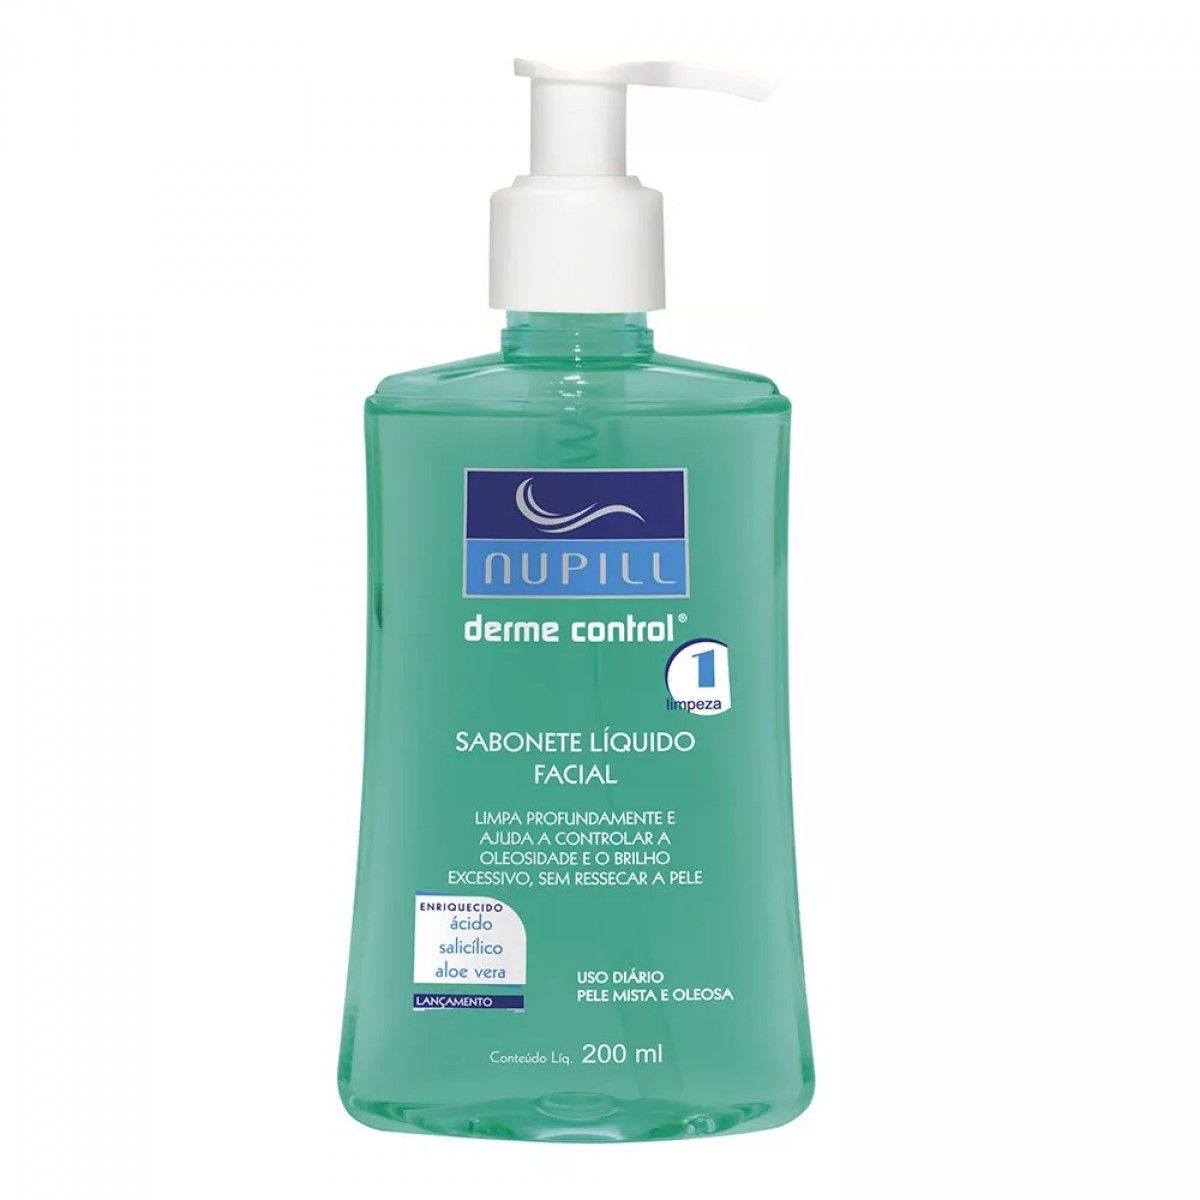 Sabonete Liquido Facia Derme Control 200ml-Nupill